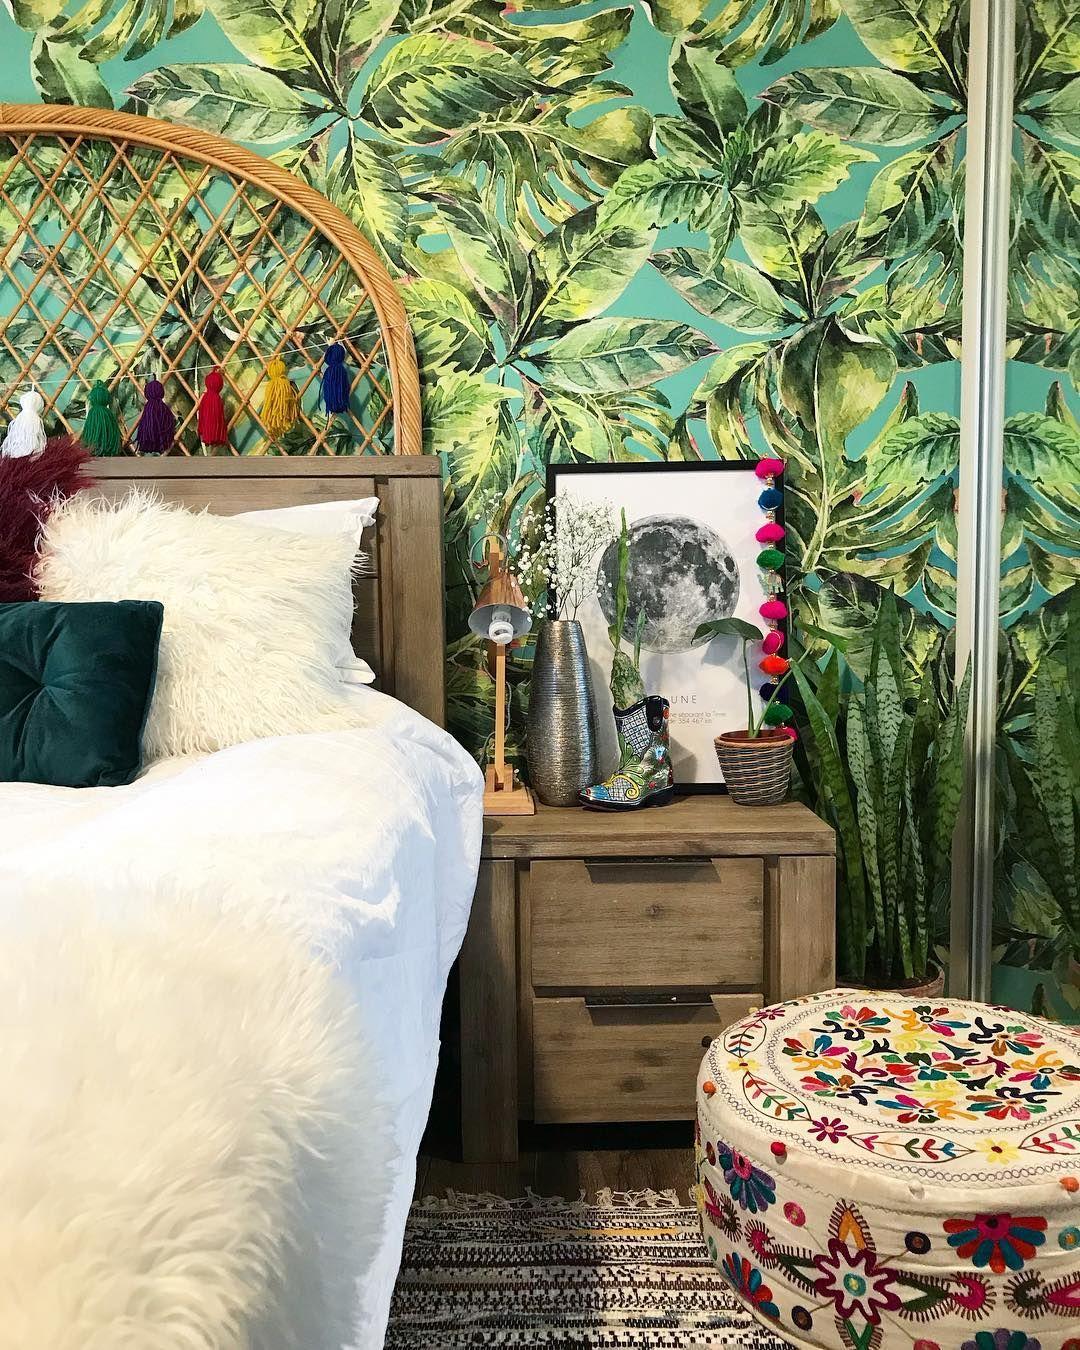 Amazon Rainforest removable wallpaper Flower mural